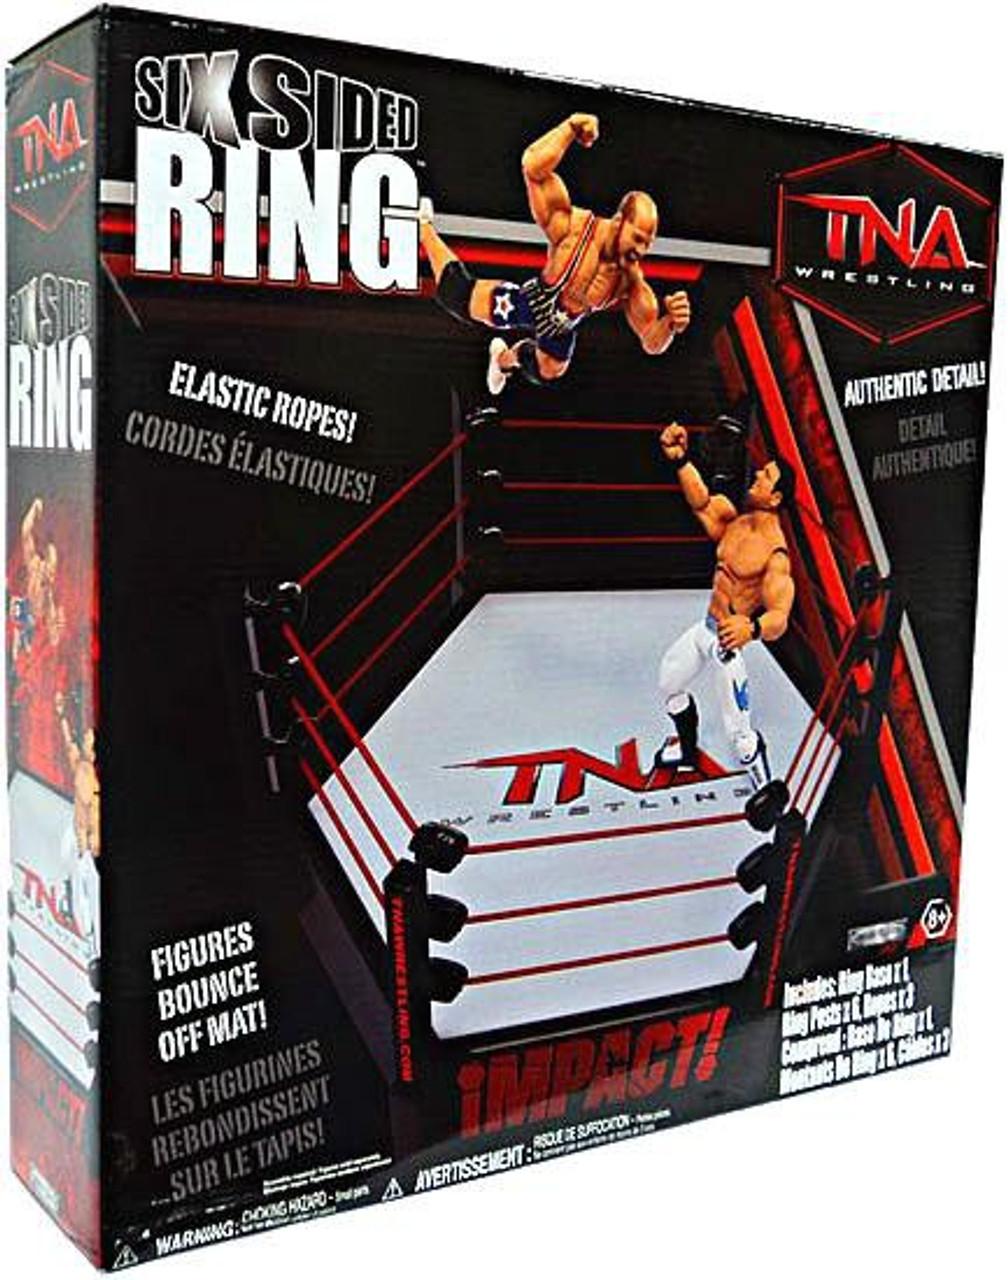 Tna Wrestling Playsets Six Sided Ring Action Figure Playset Jakks